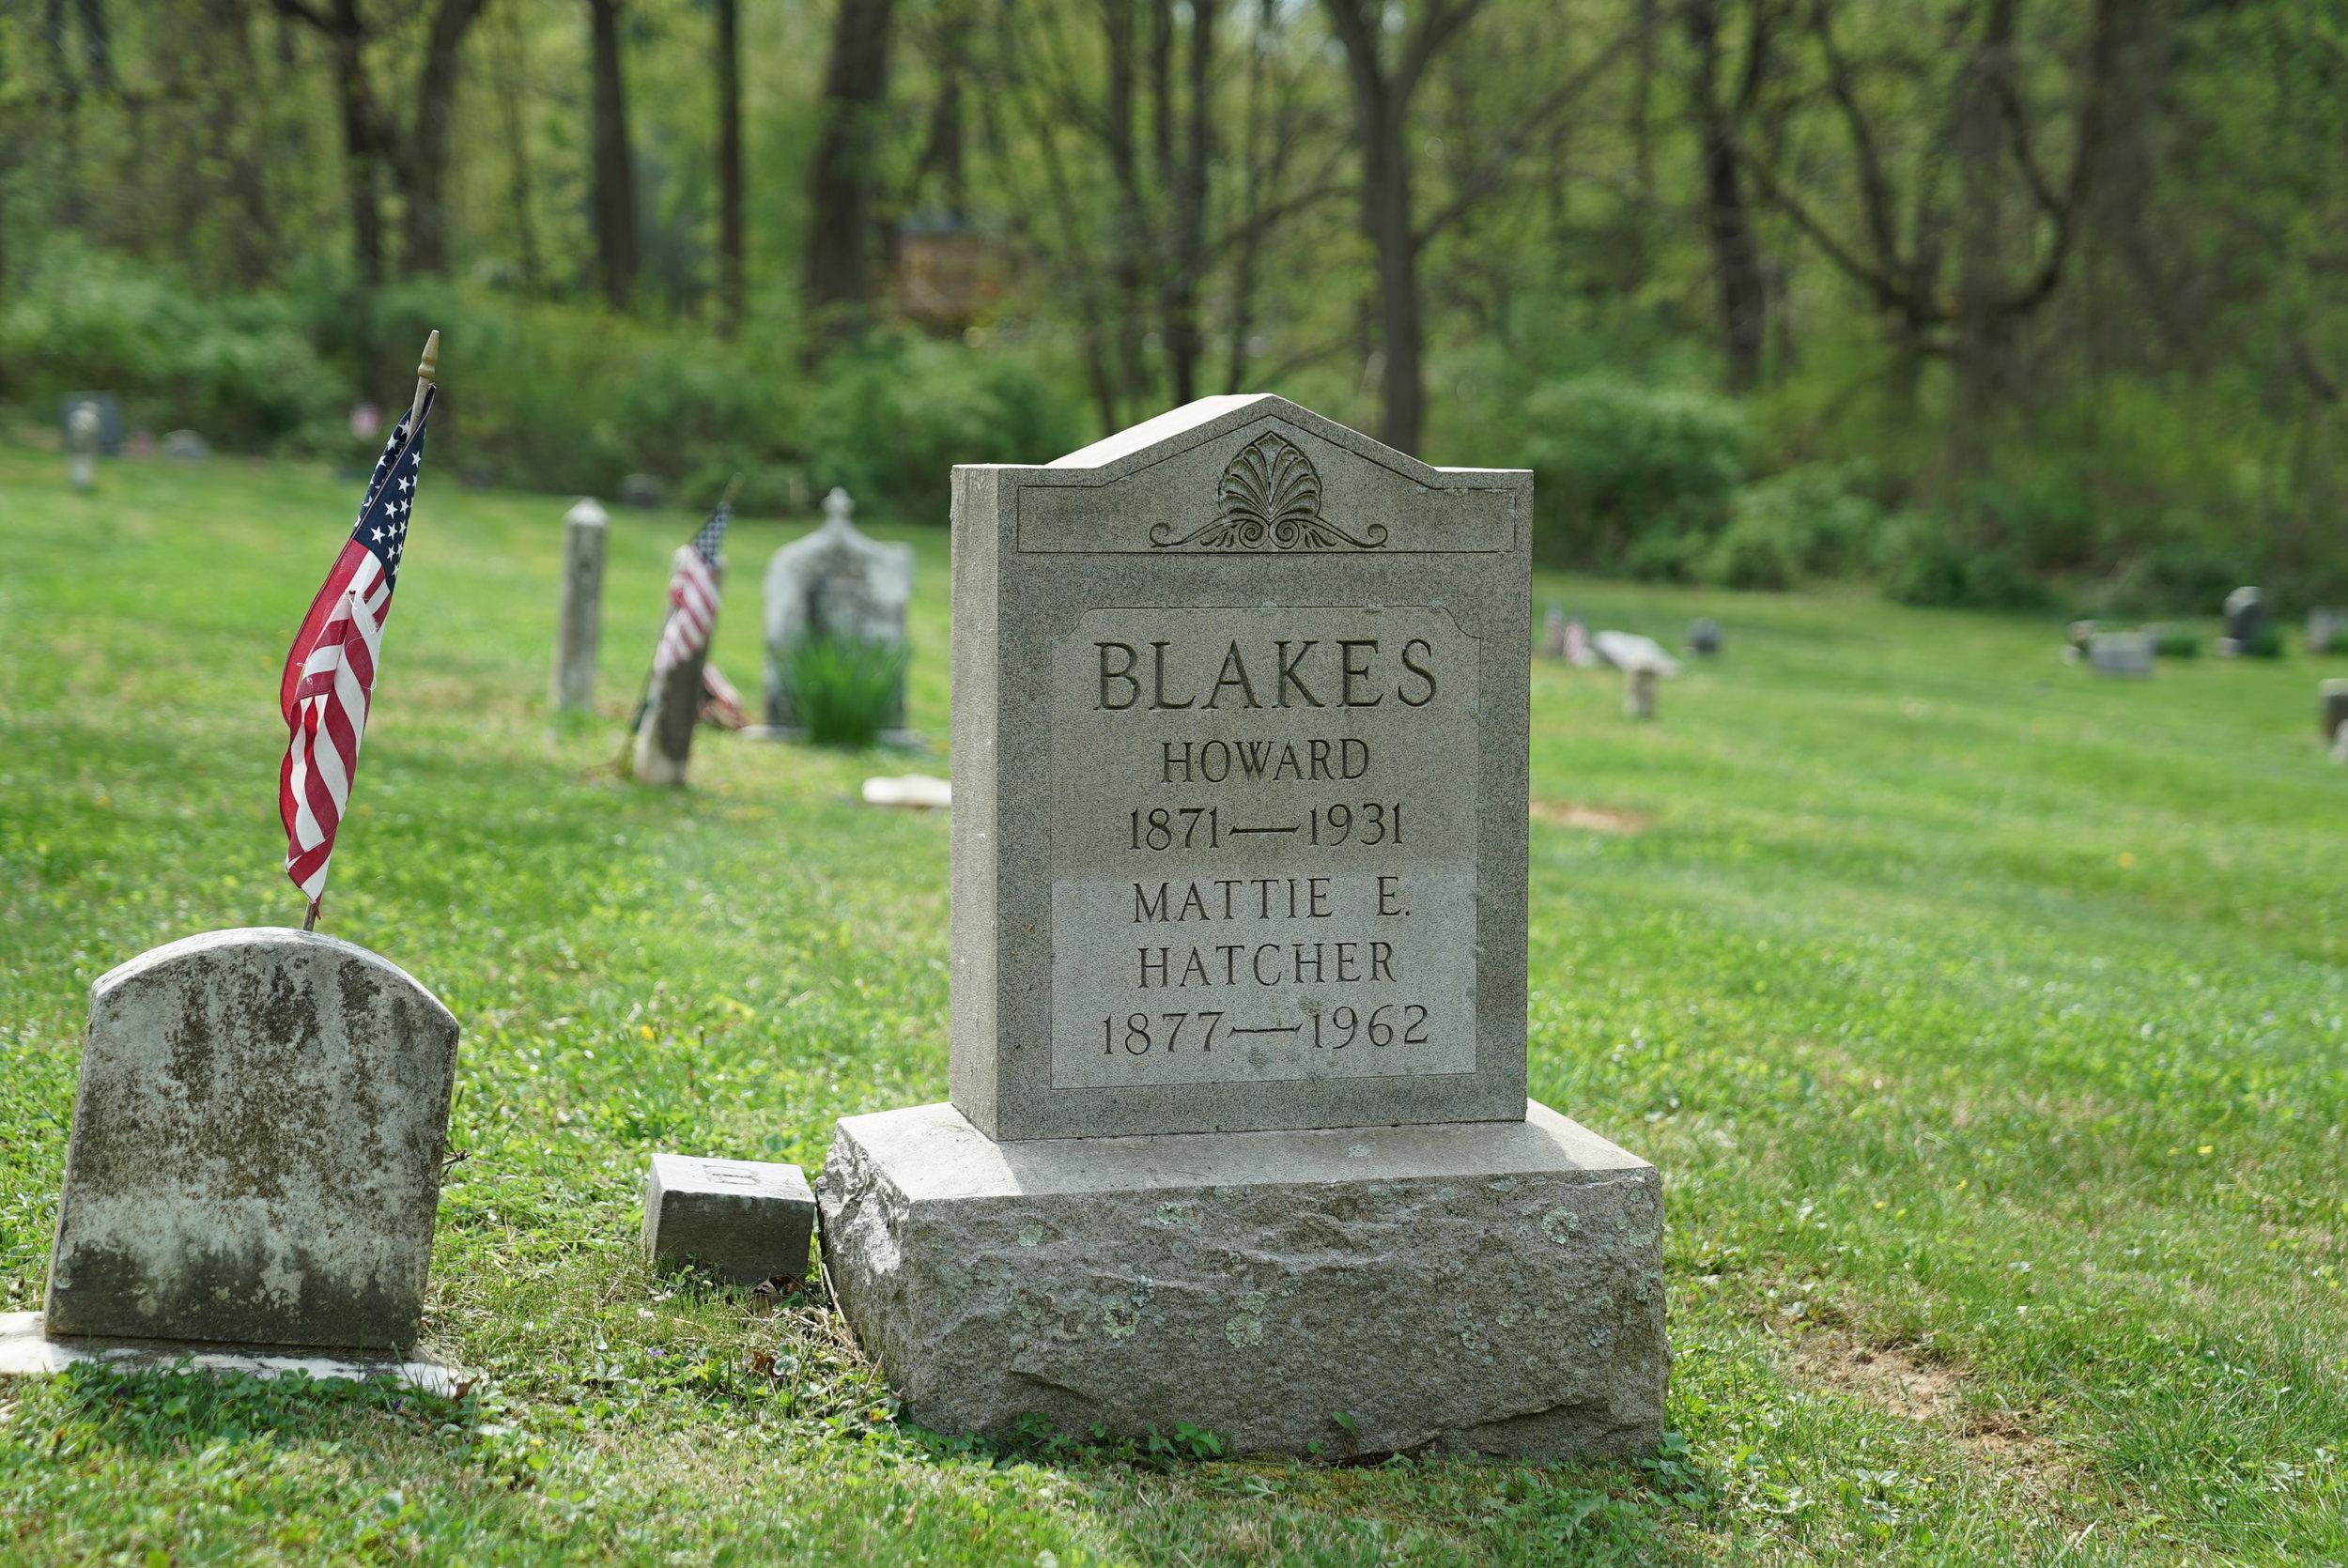 Tombstone at Thornbury African Methodist Episcopal Church Cemetery. Glen Mills, Pennsylvania area.